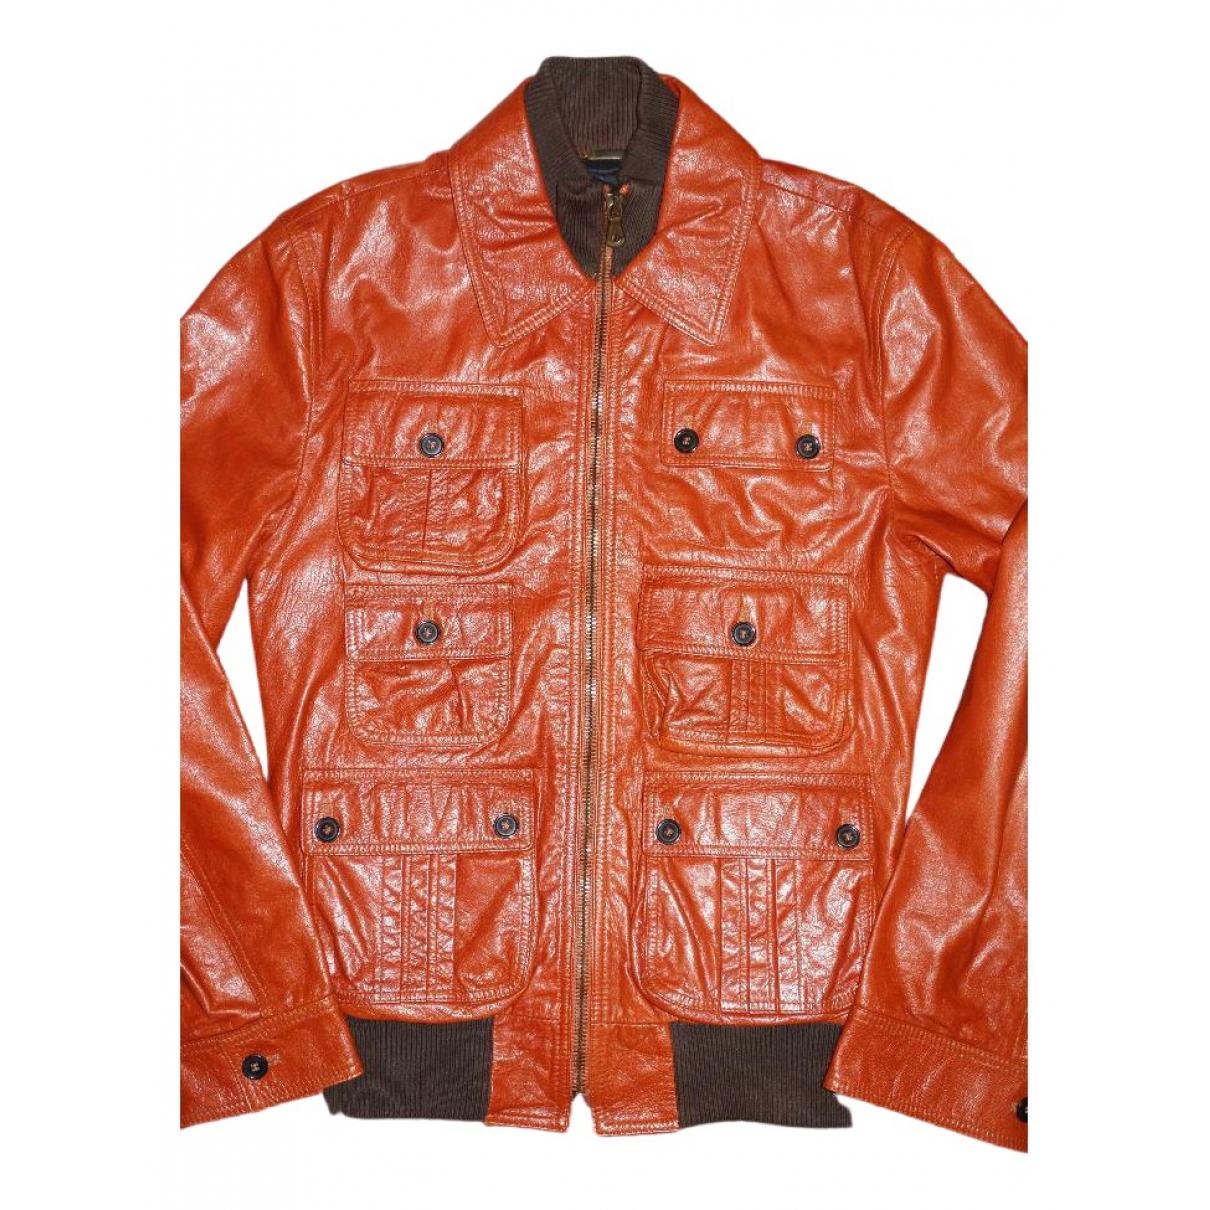 Dolce & Gabbana N Orange Leather jacket  for Men 48 IT